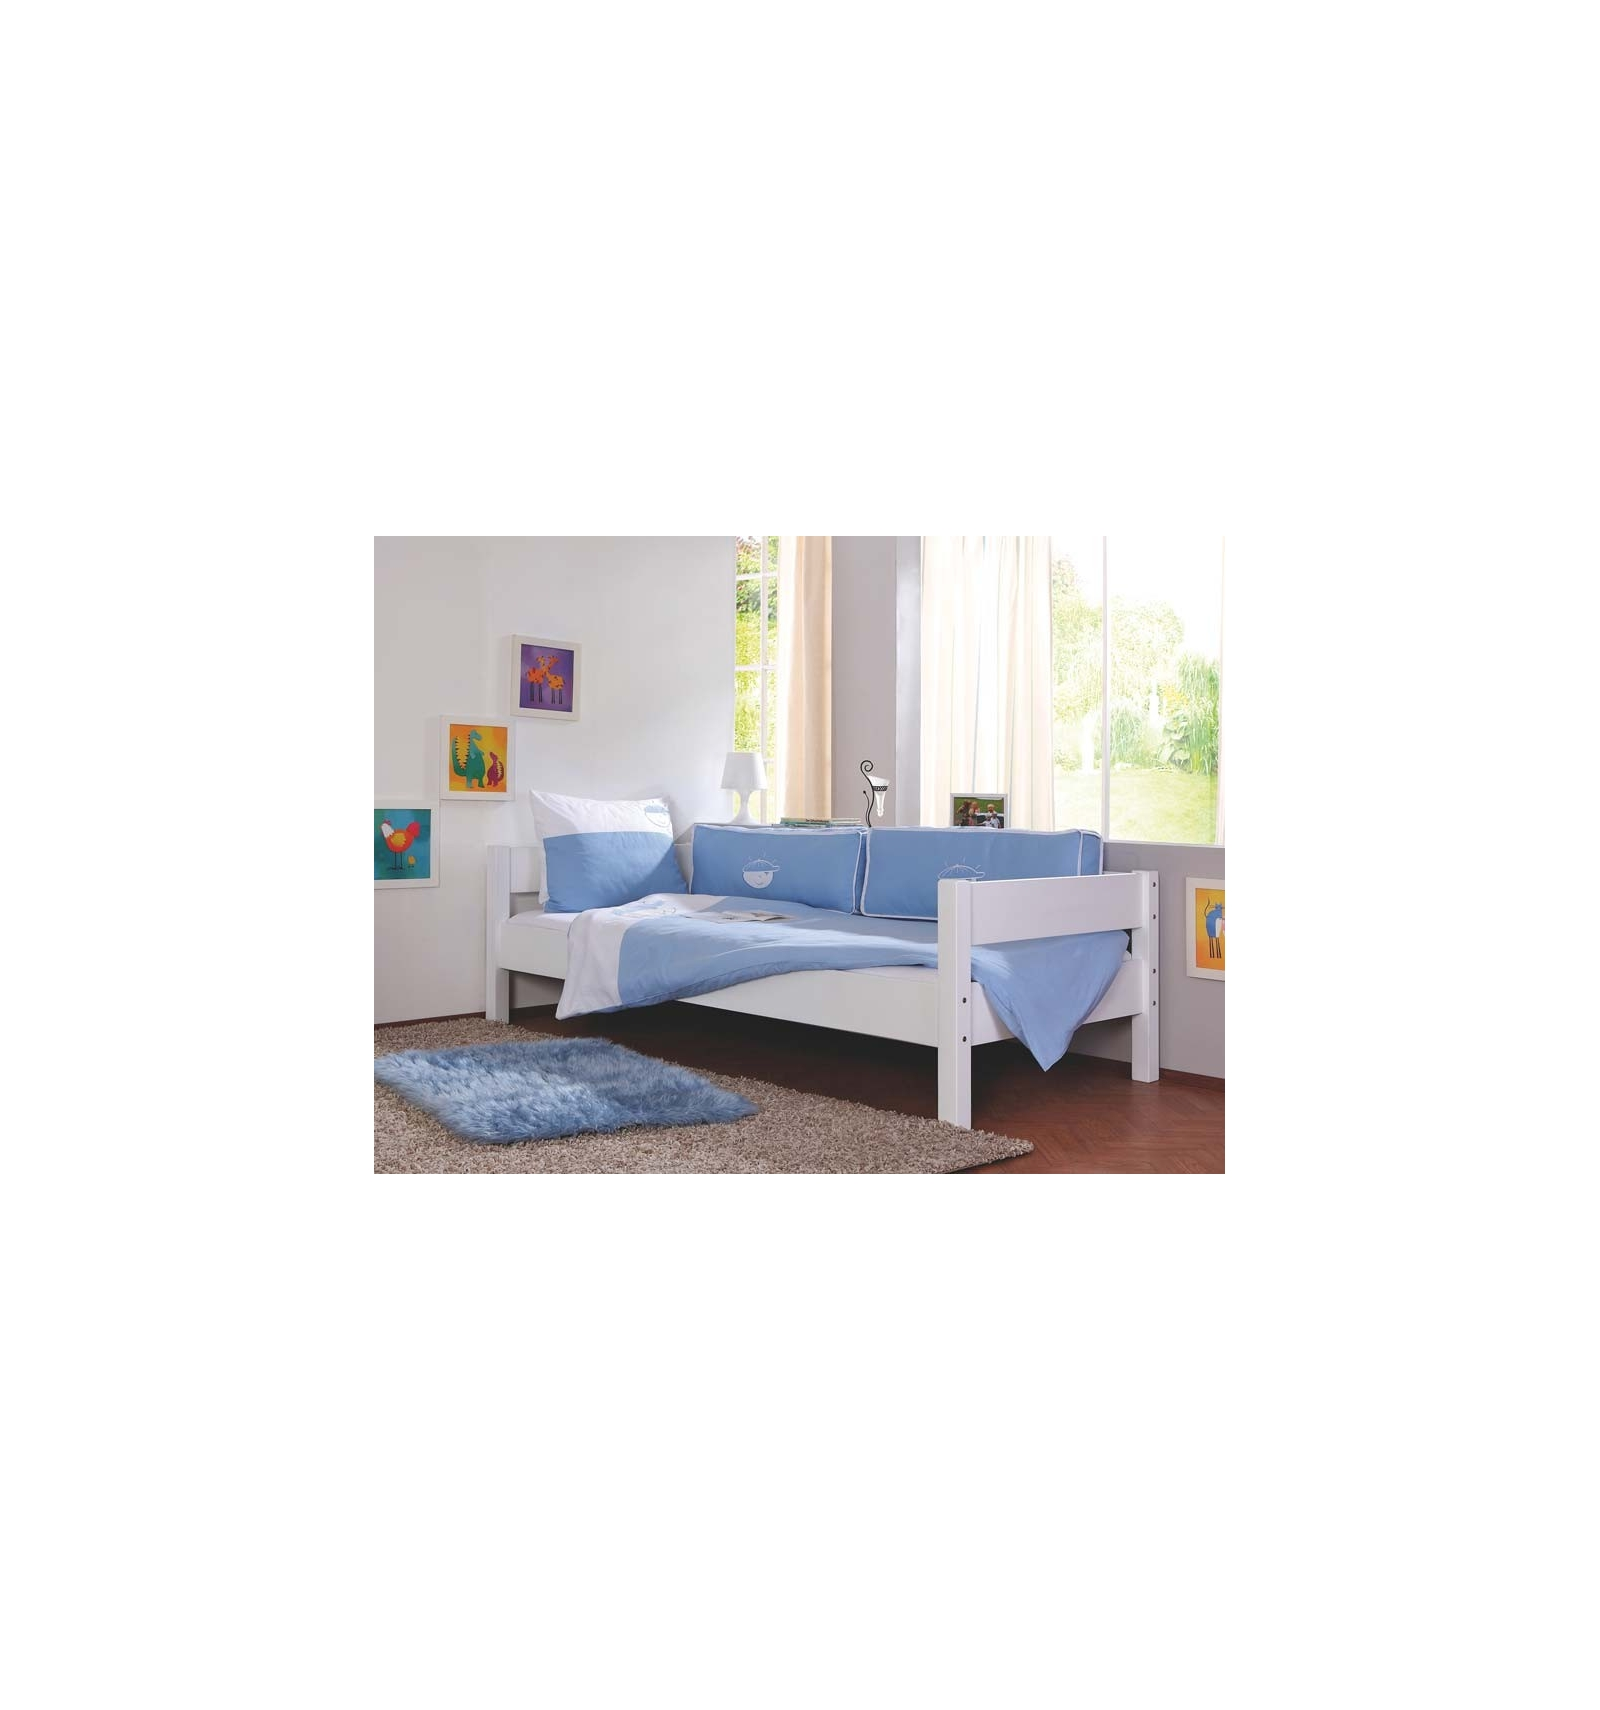 linge de lit pour enfants. Black Bedroom Furniture Sets. Home Design Ideas